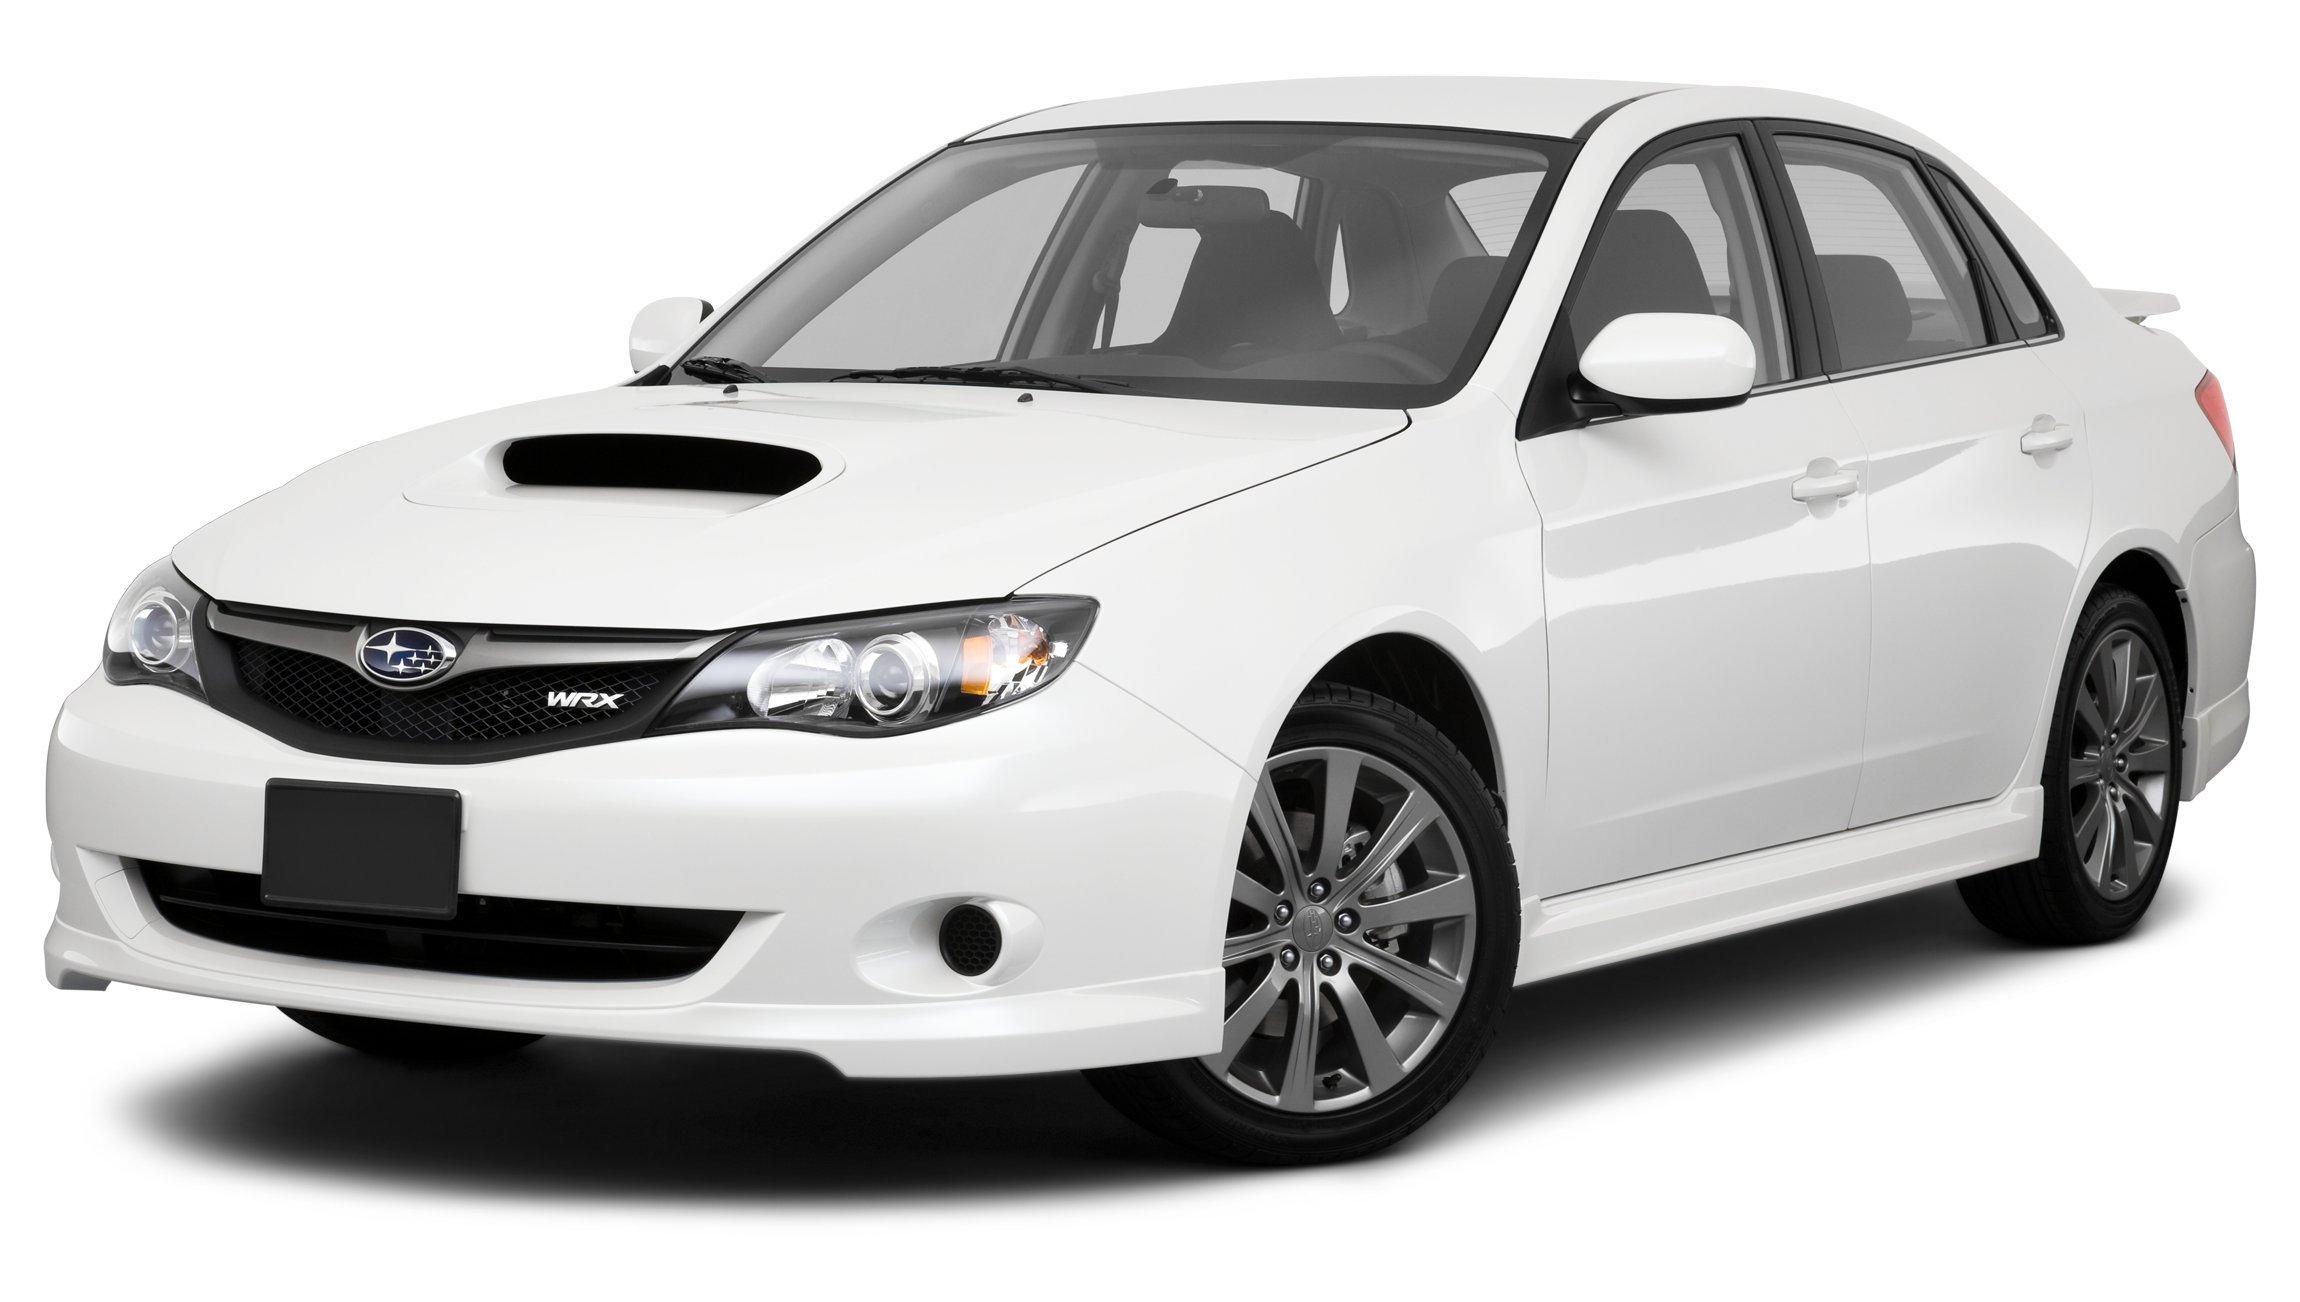 Amazon 2010 subaru impreza reviews images and specs vehicles 2010 subaru impreza wrx 4 door manual transmission vanachro Gallery